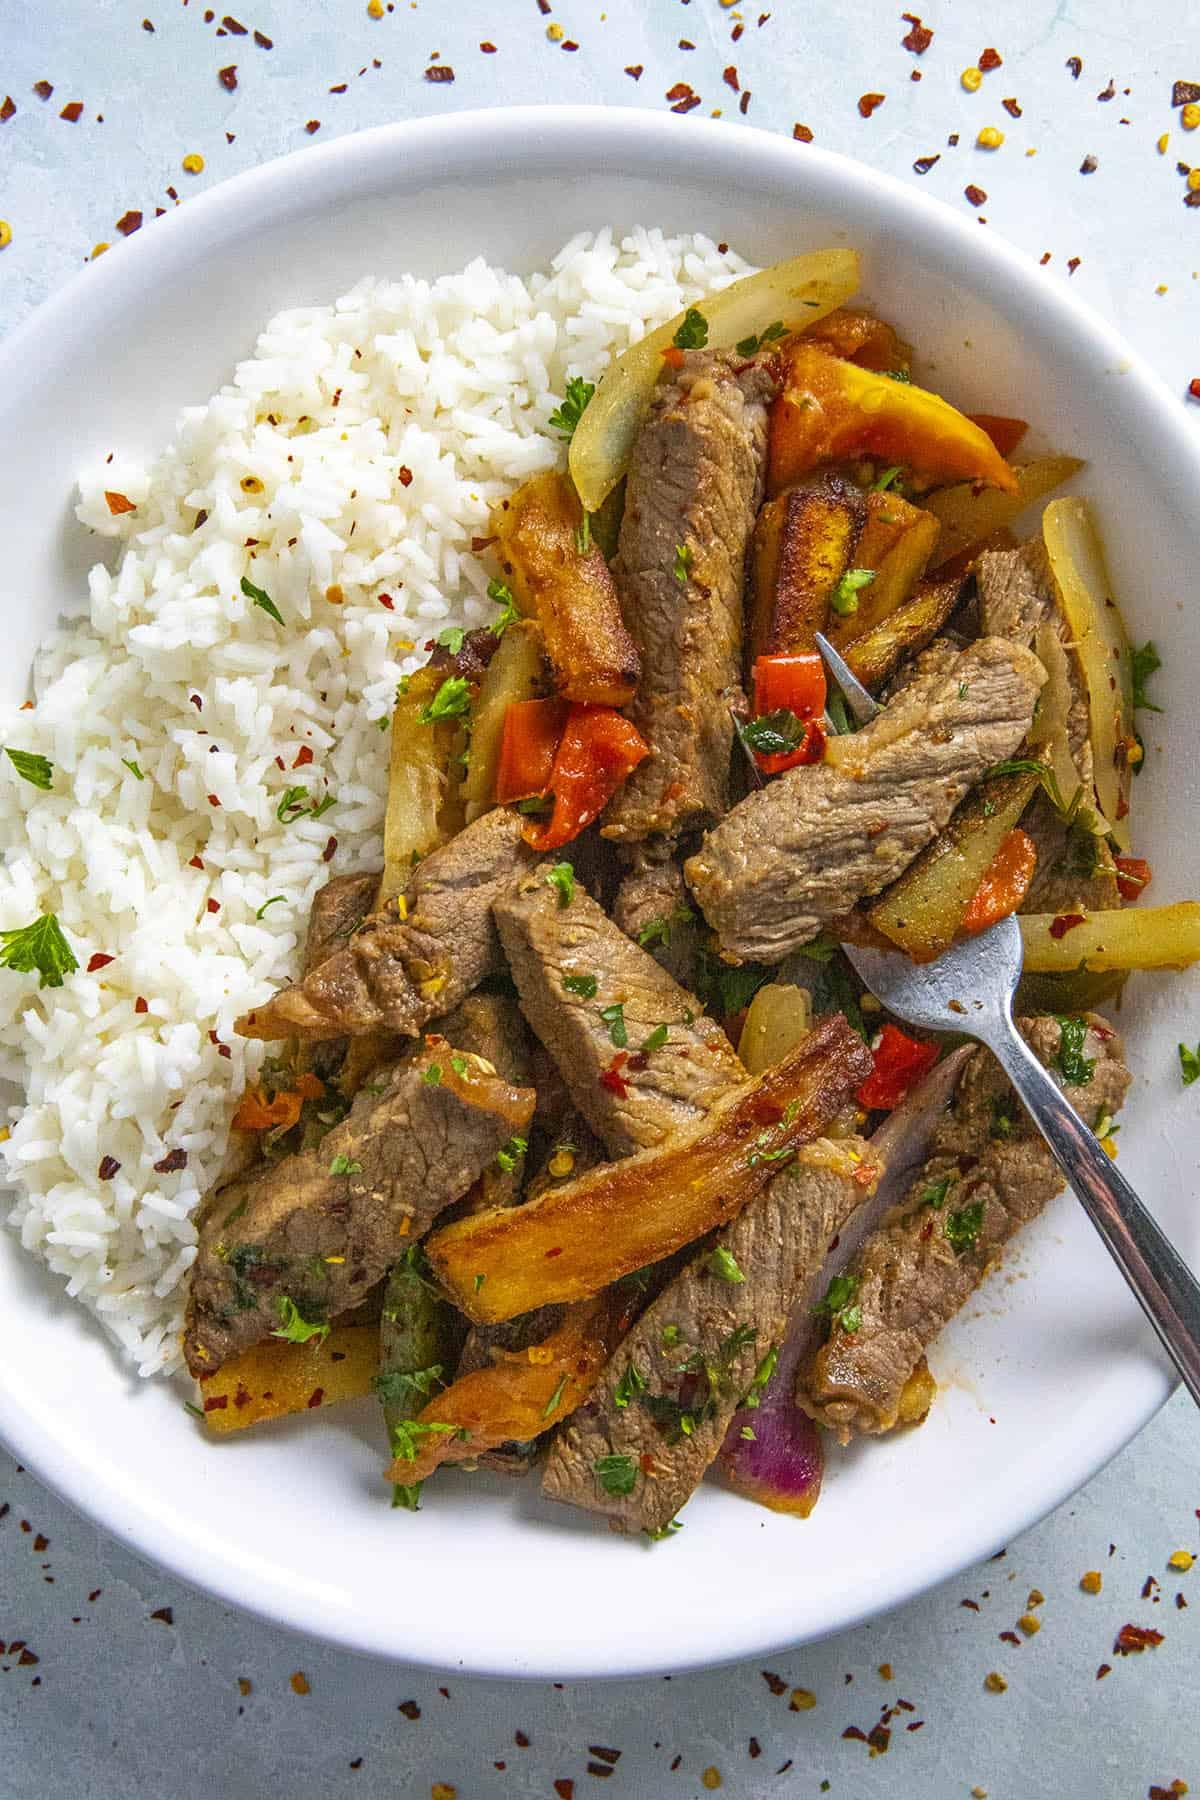 Lomo Saltado (Peruvian Beef Stir Fry with French Fries)